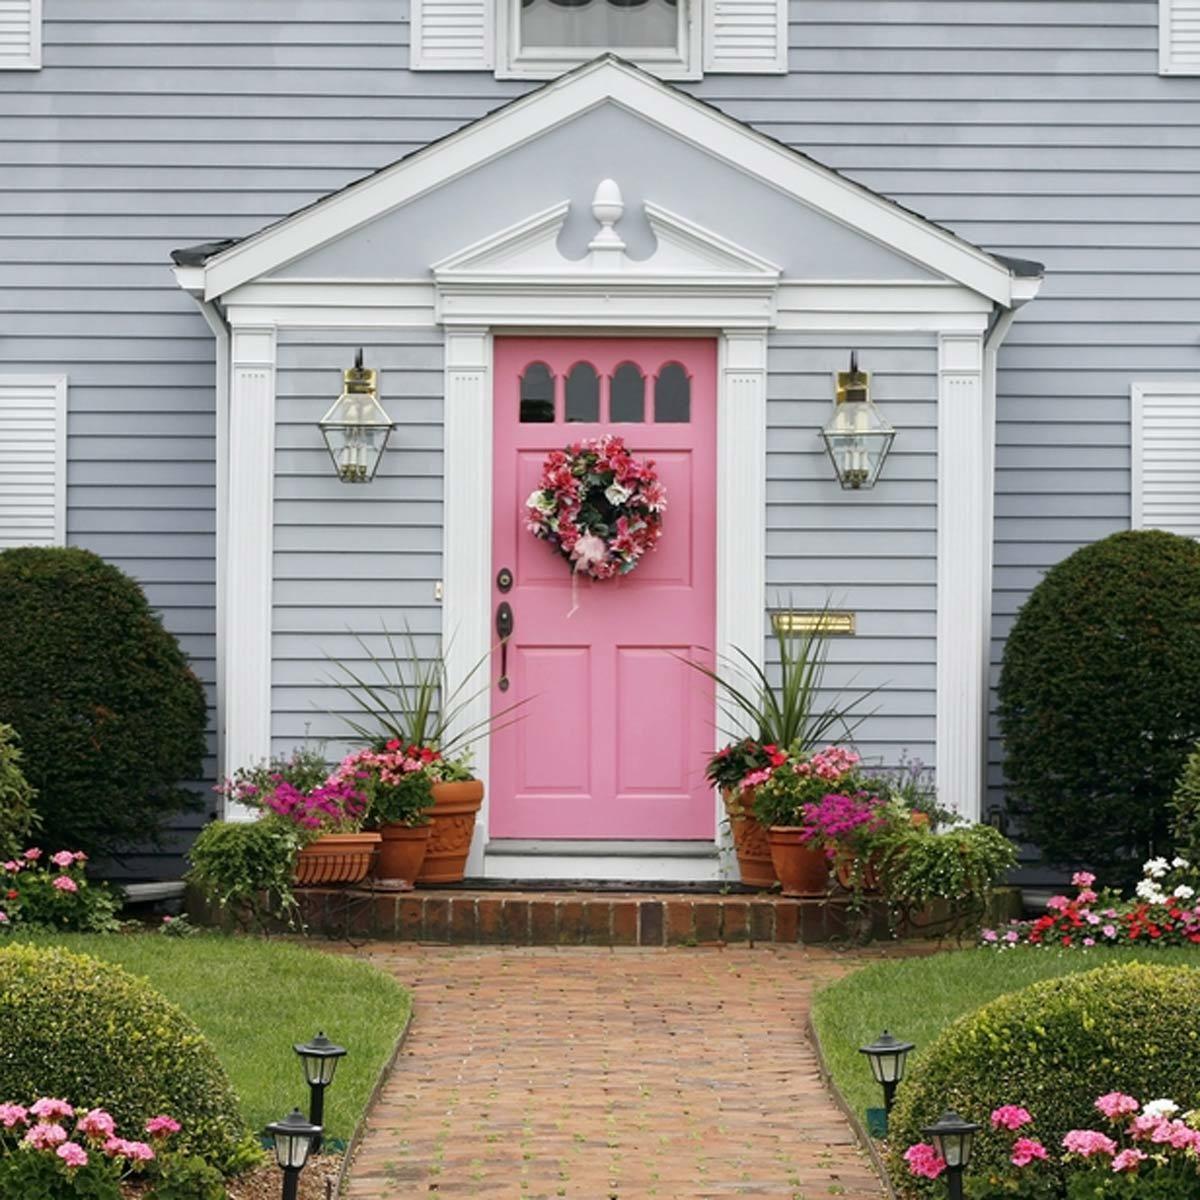 Joy Brown Shutterstock